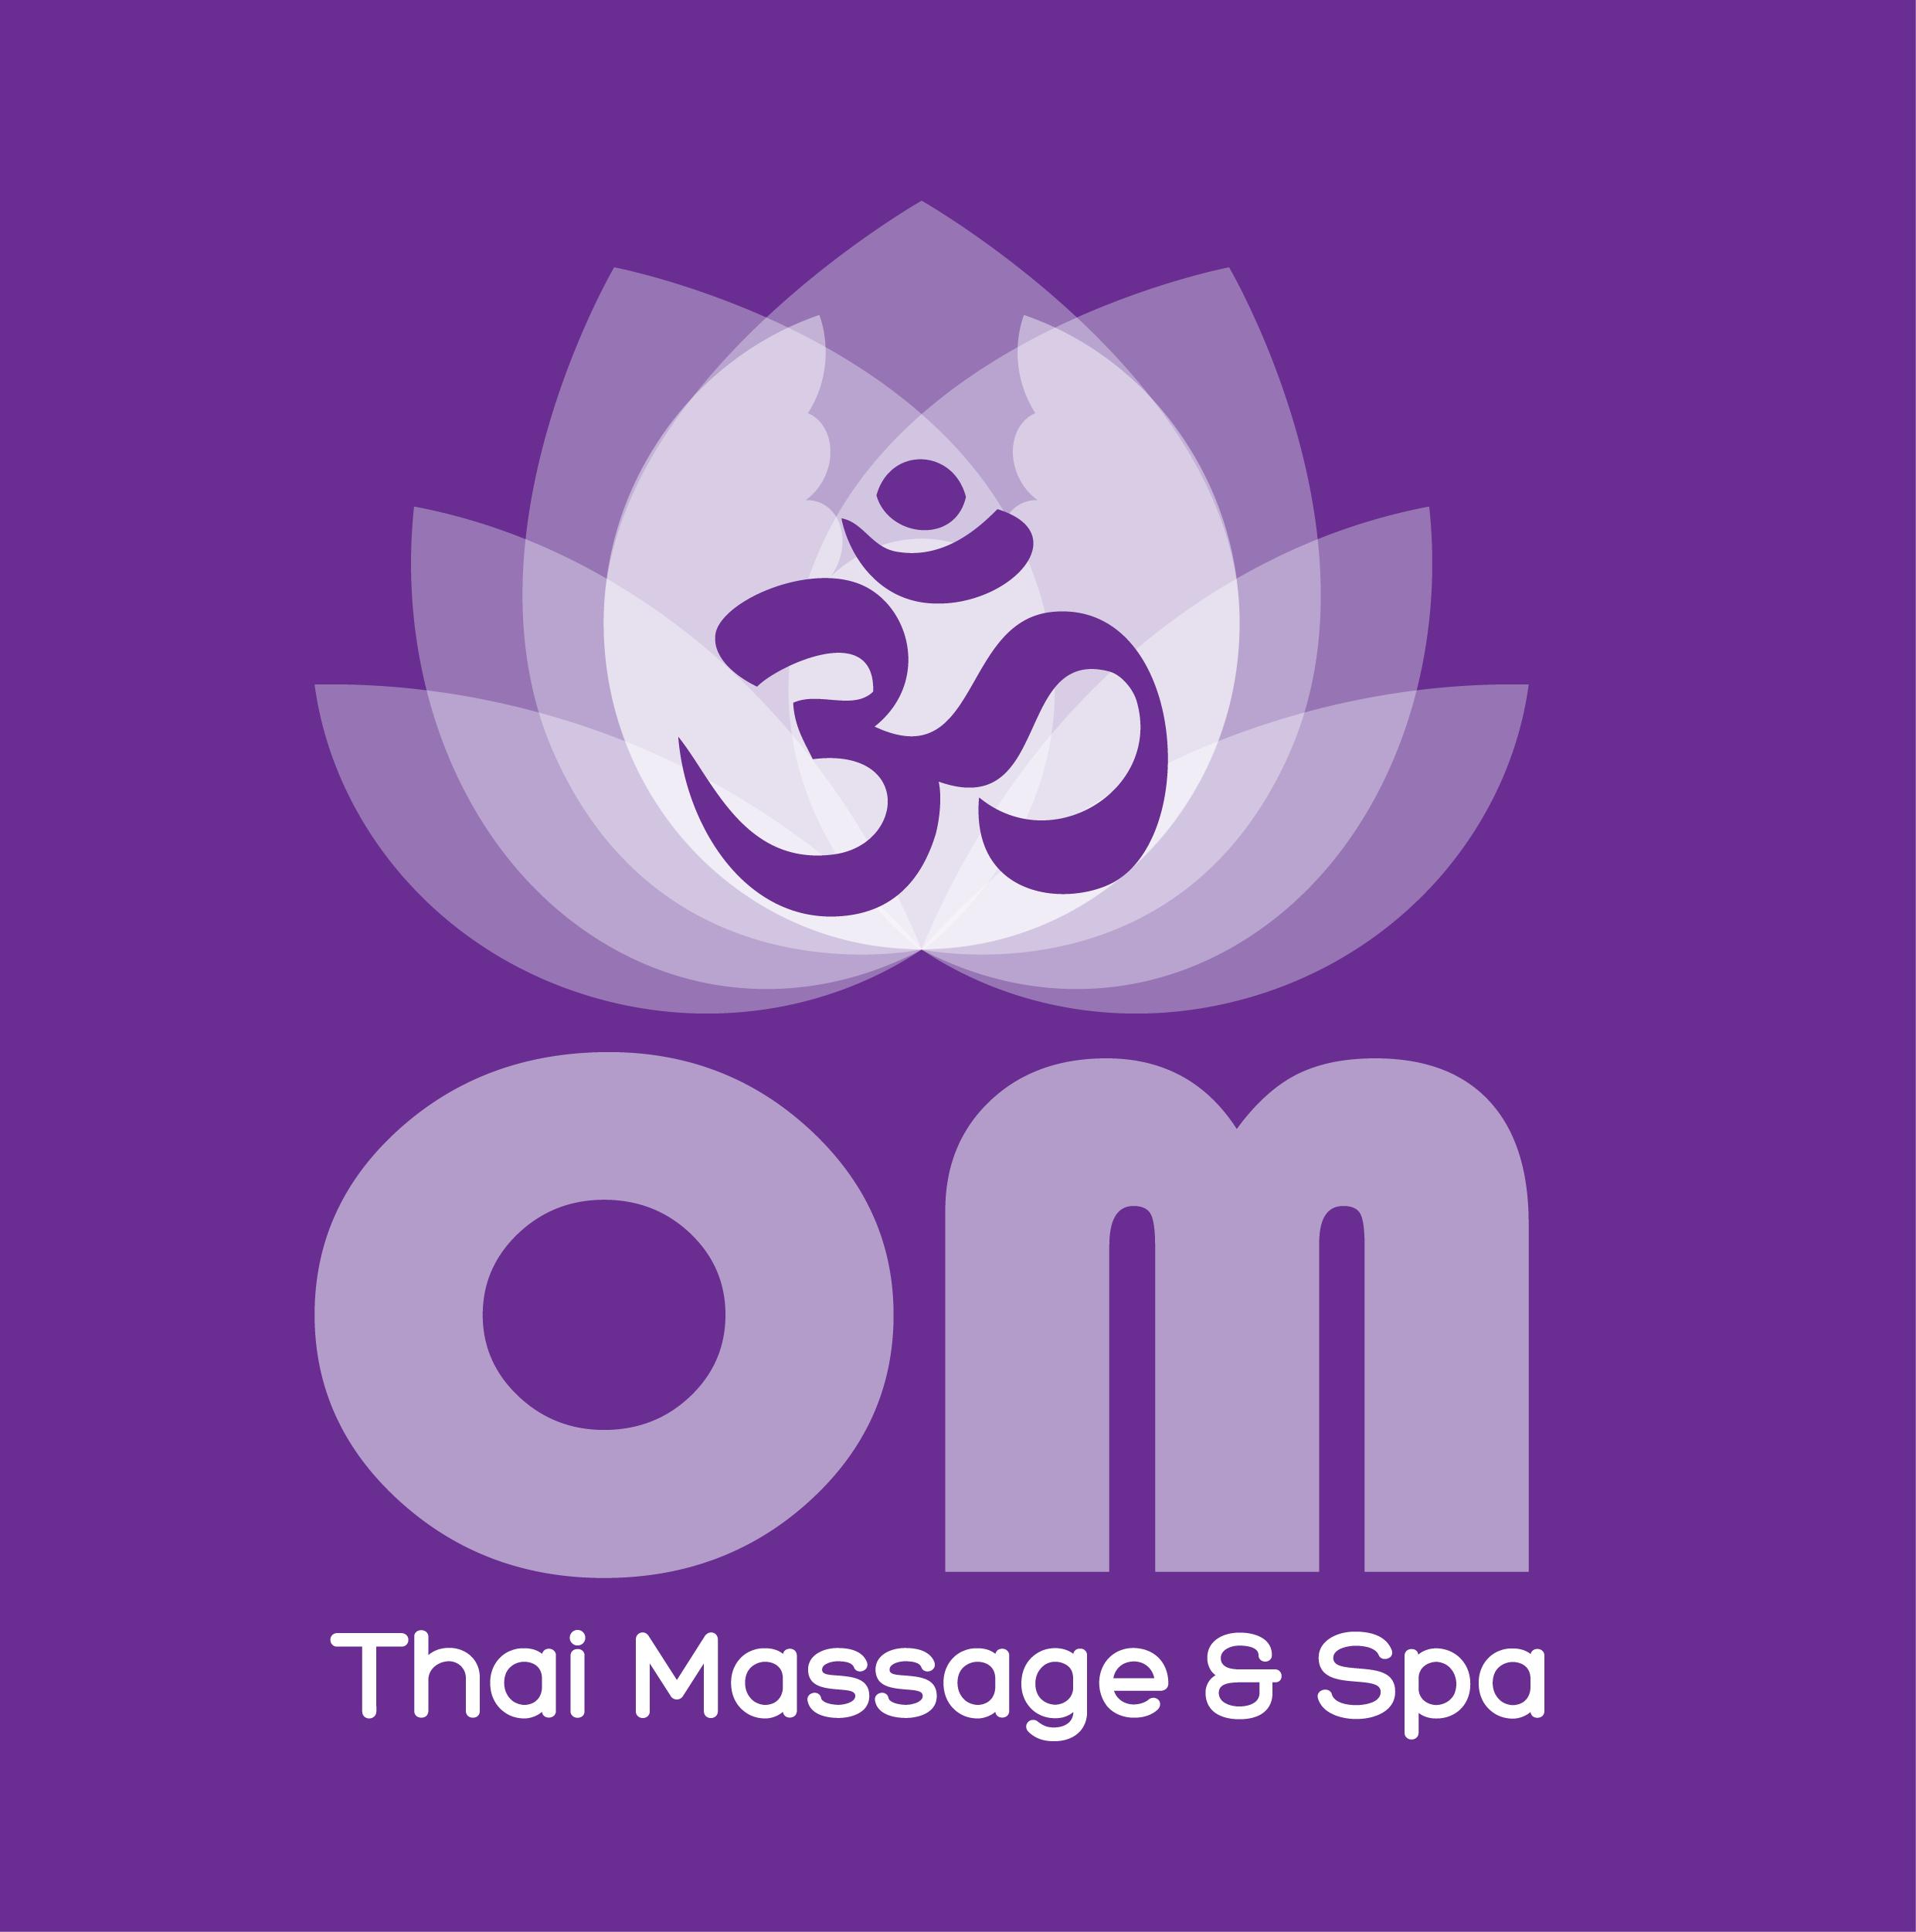 OM Thai Massage & Spa, London